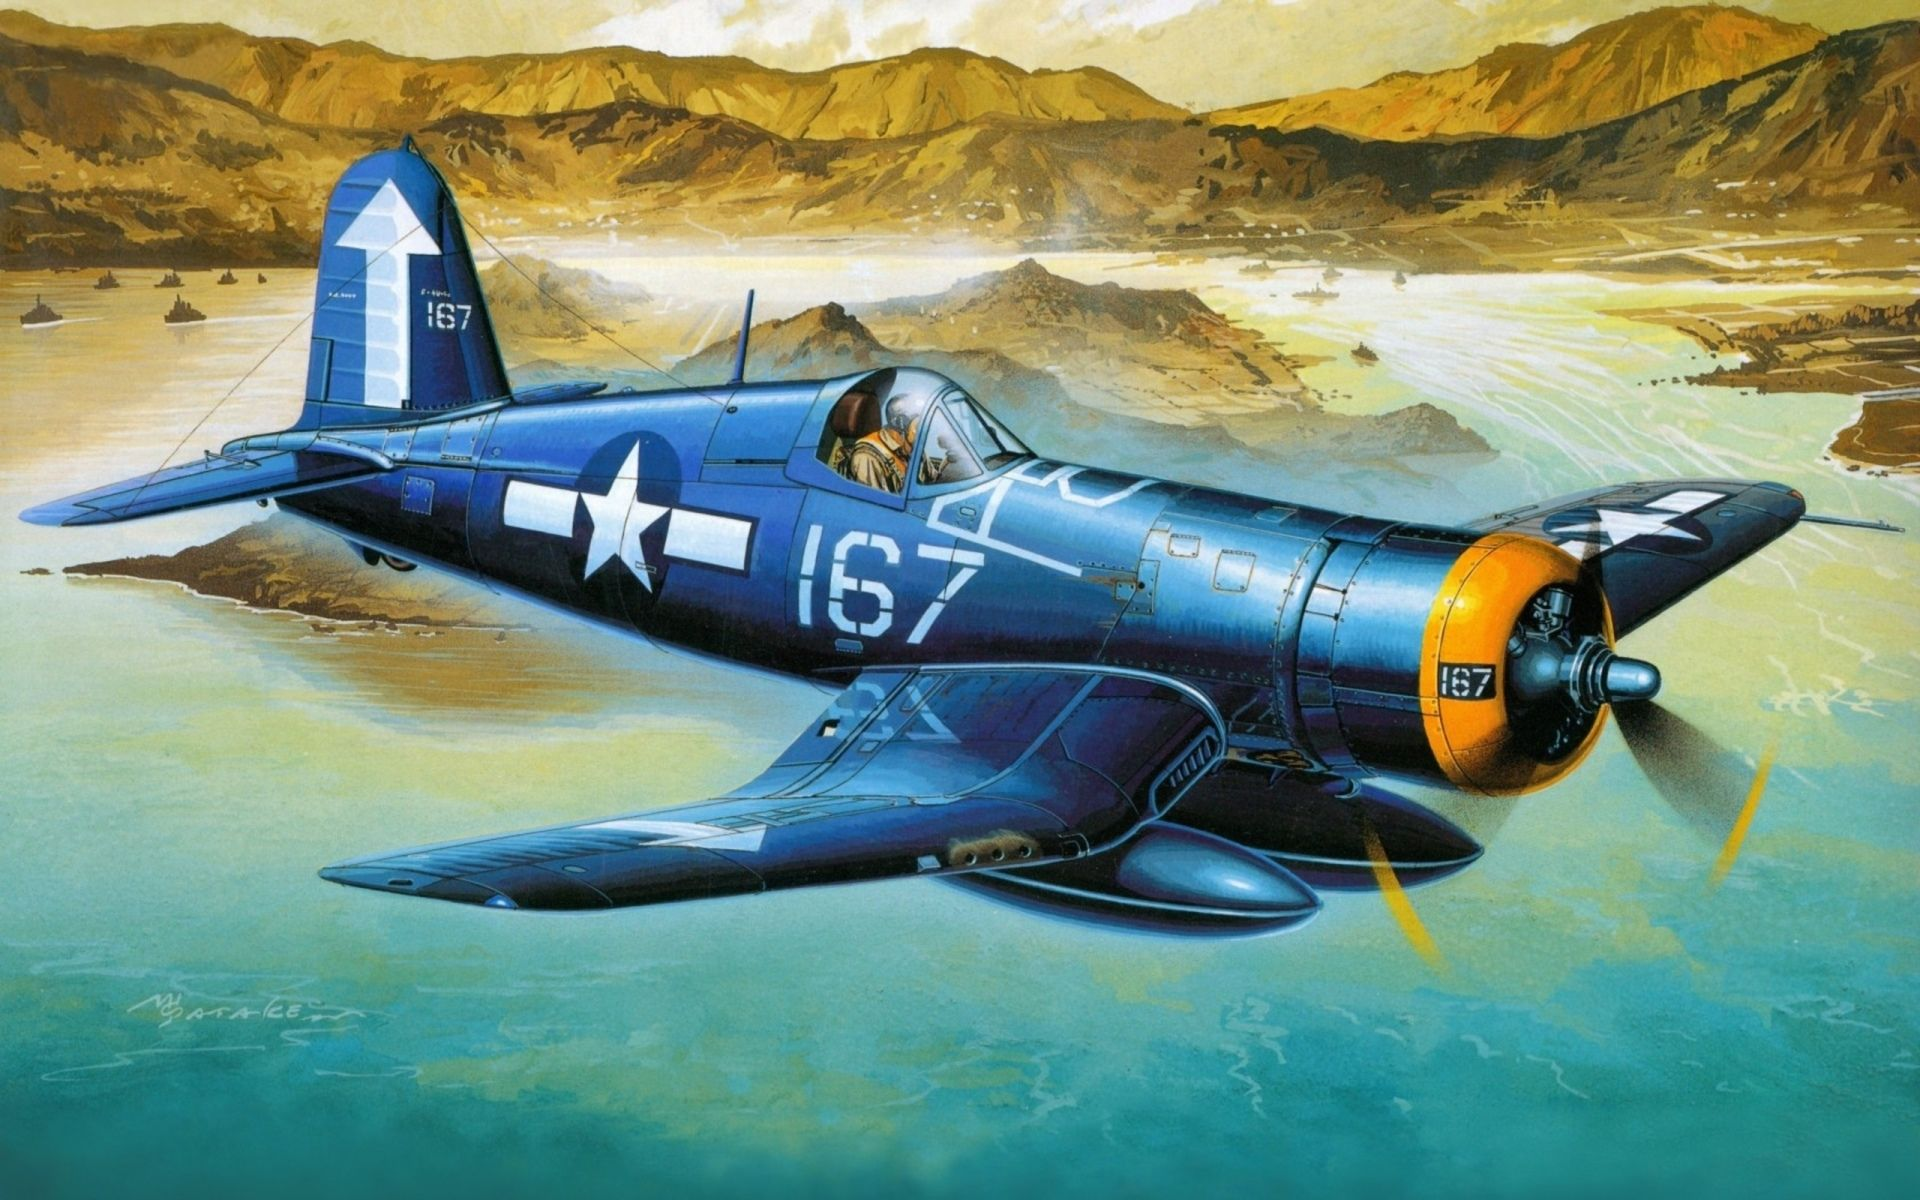 Militaire Vought F4U Corsair Fond d'écran | F4u corsair, Corsaire, Avion militaire